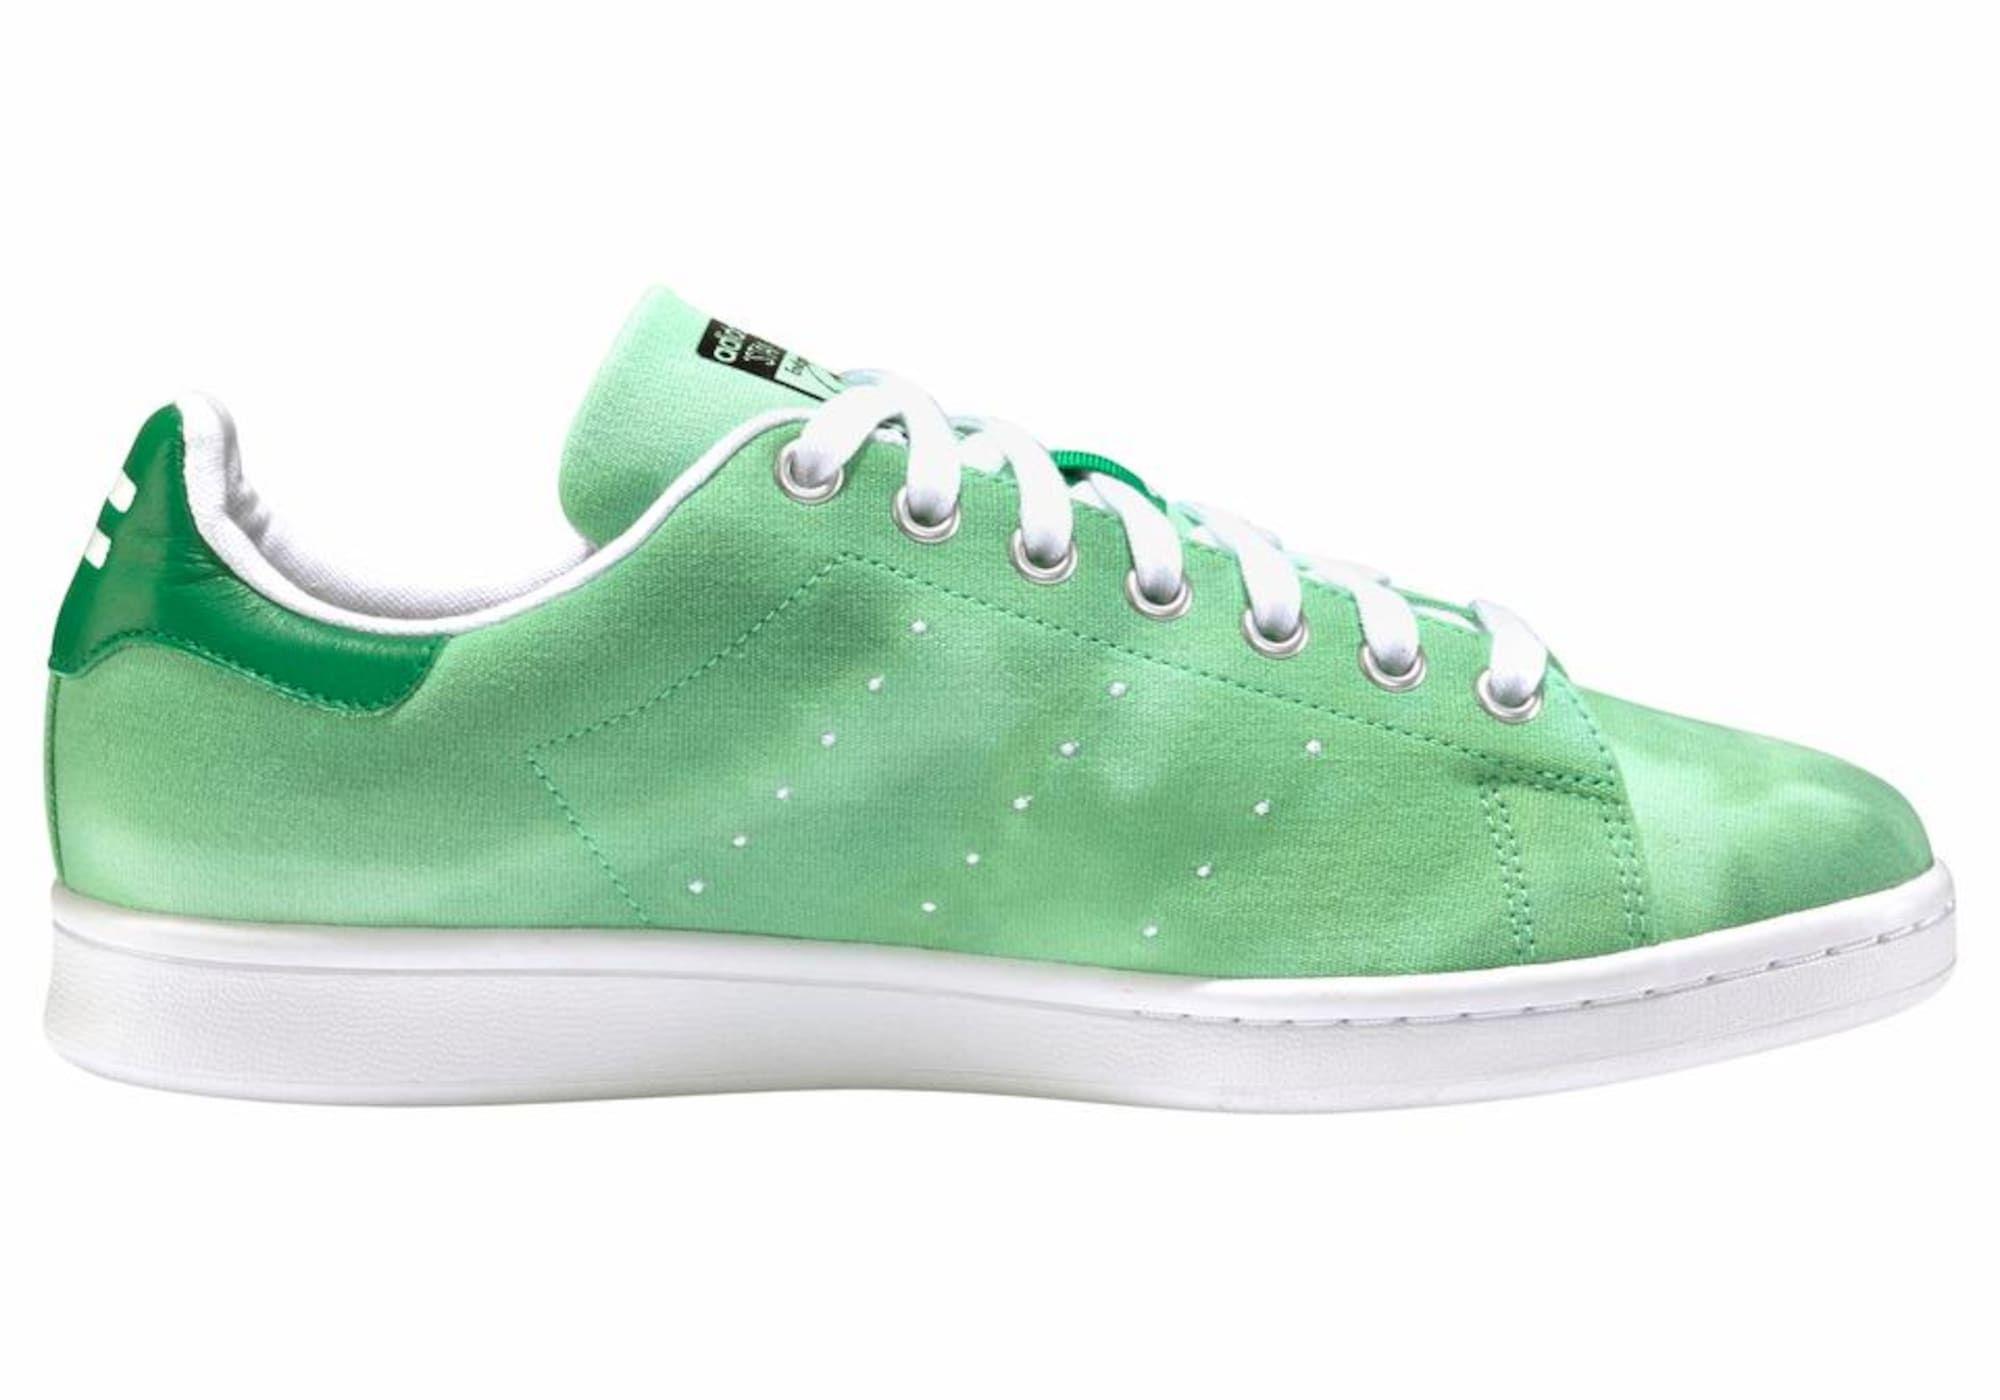 Adidas Originals Sneaker Pw Hu Holi Stan Smith Unisex Herren Grun Grosse 40 5 Adidas Originals Sneaker Adidas Originals Und Stan Smith